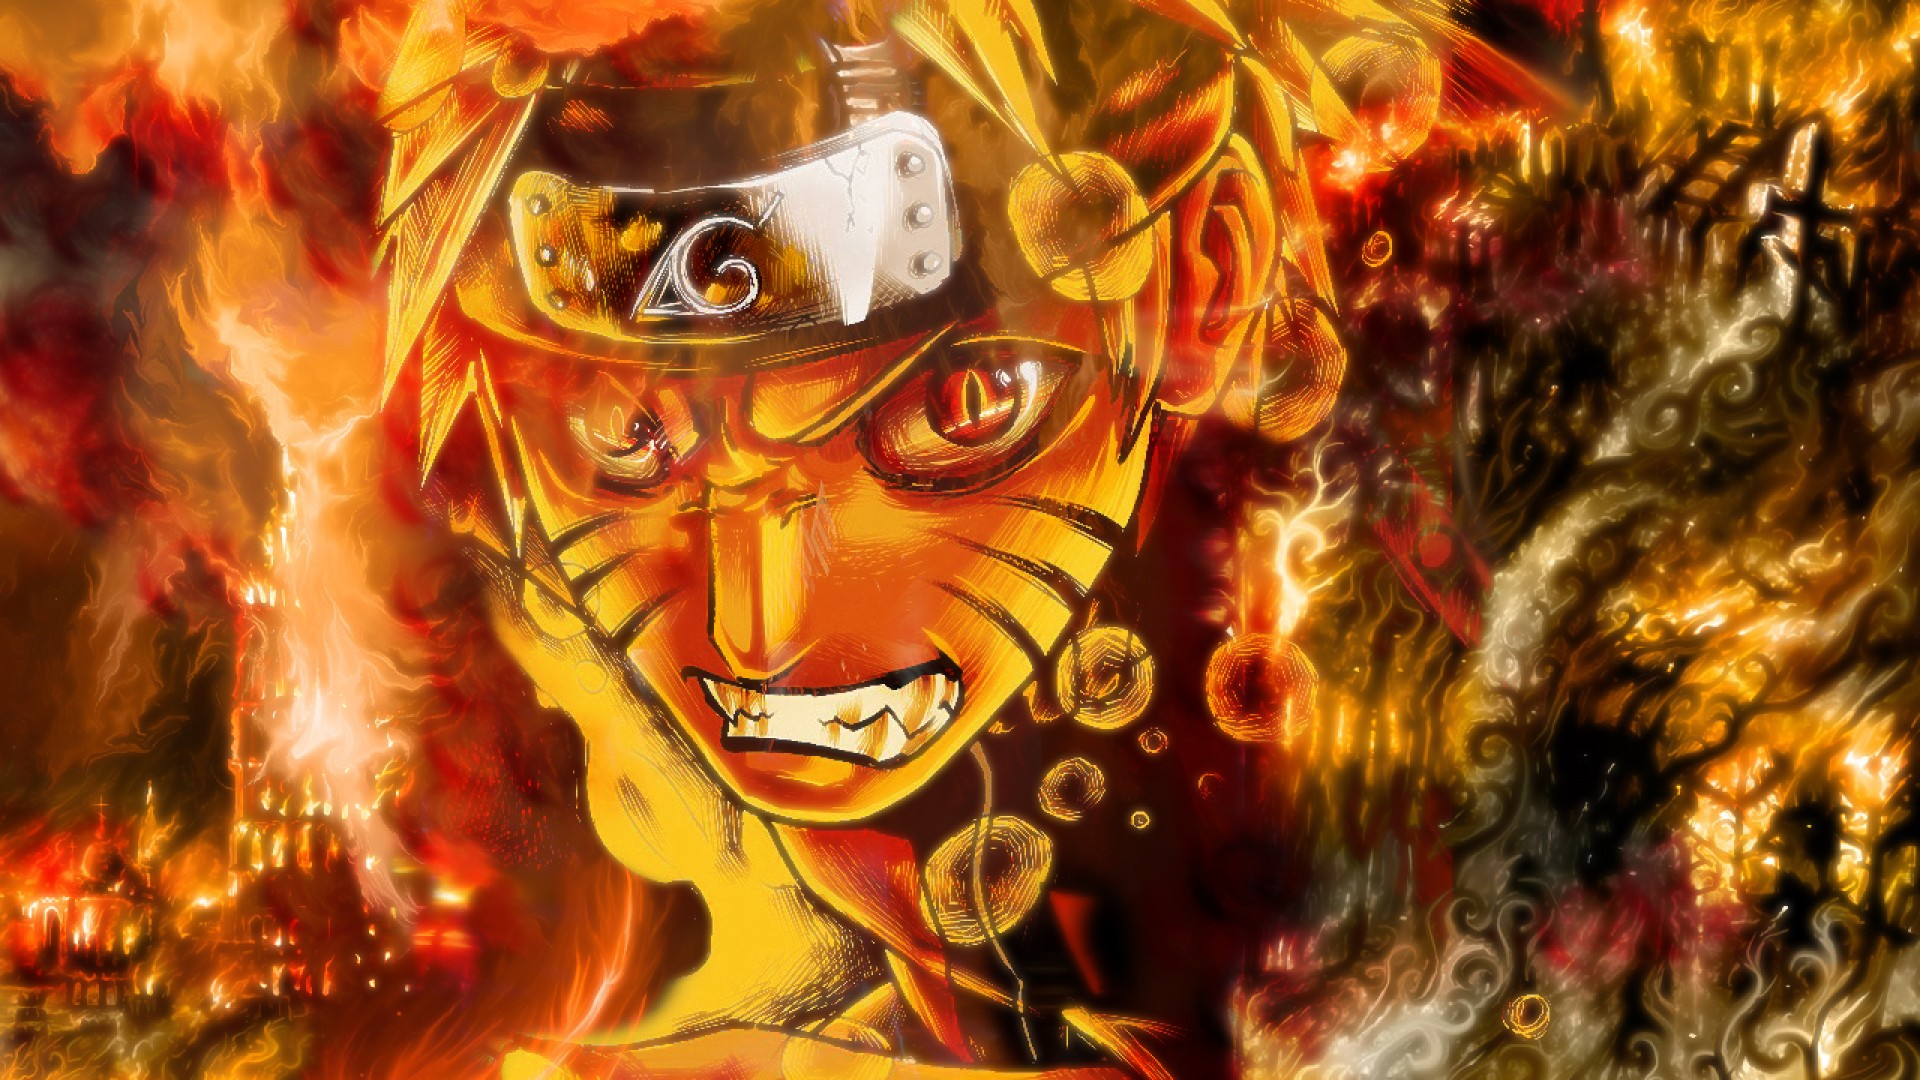 Download Gambar Naruto Uchiha Madarajpg